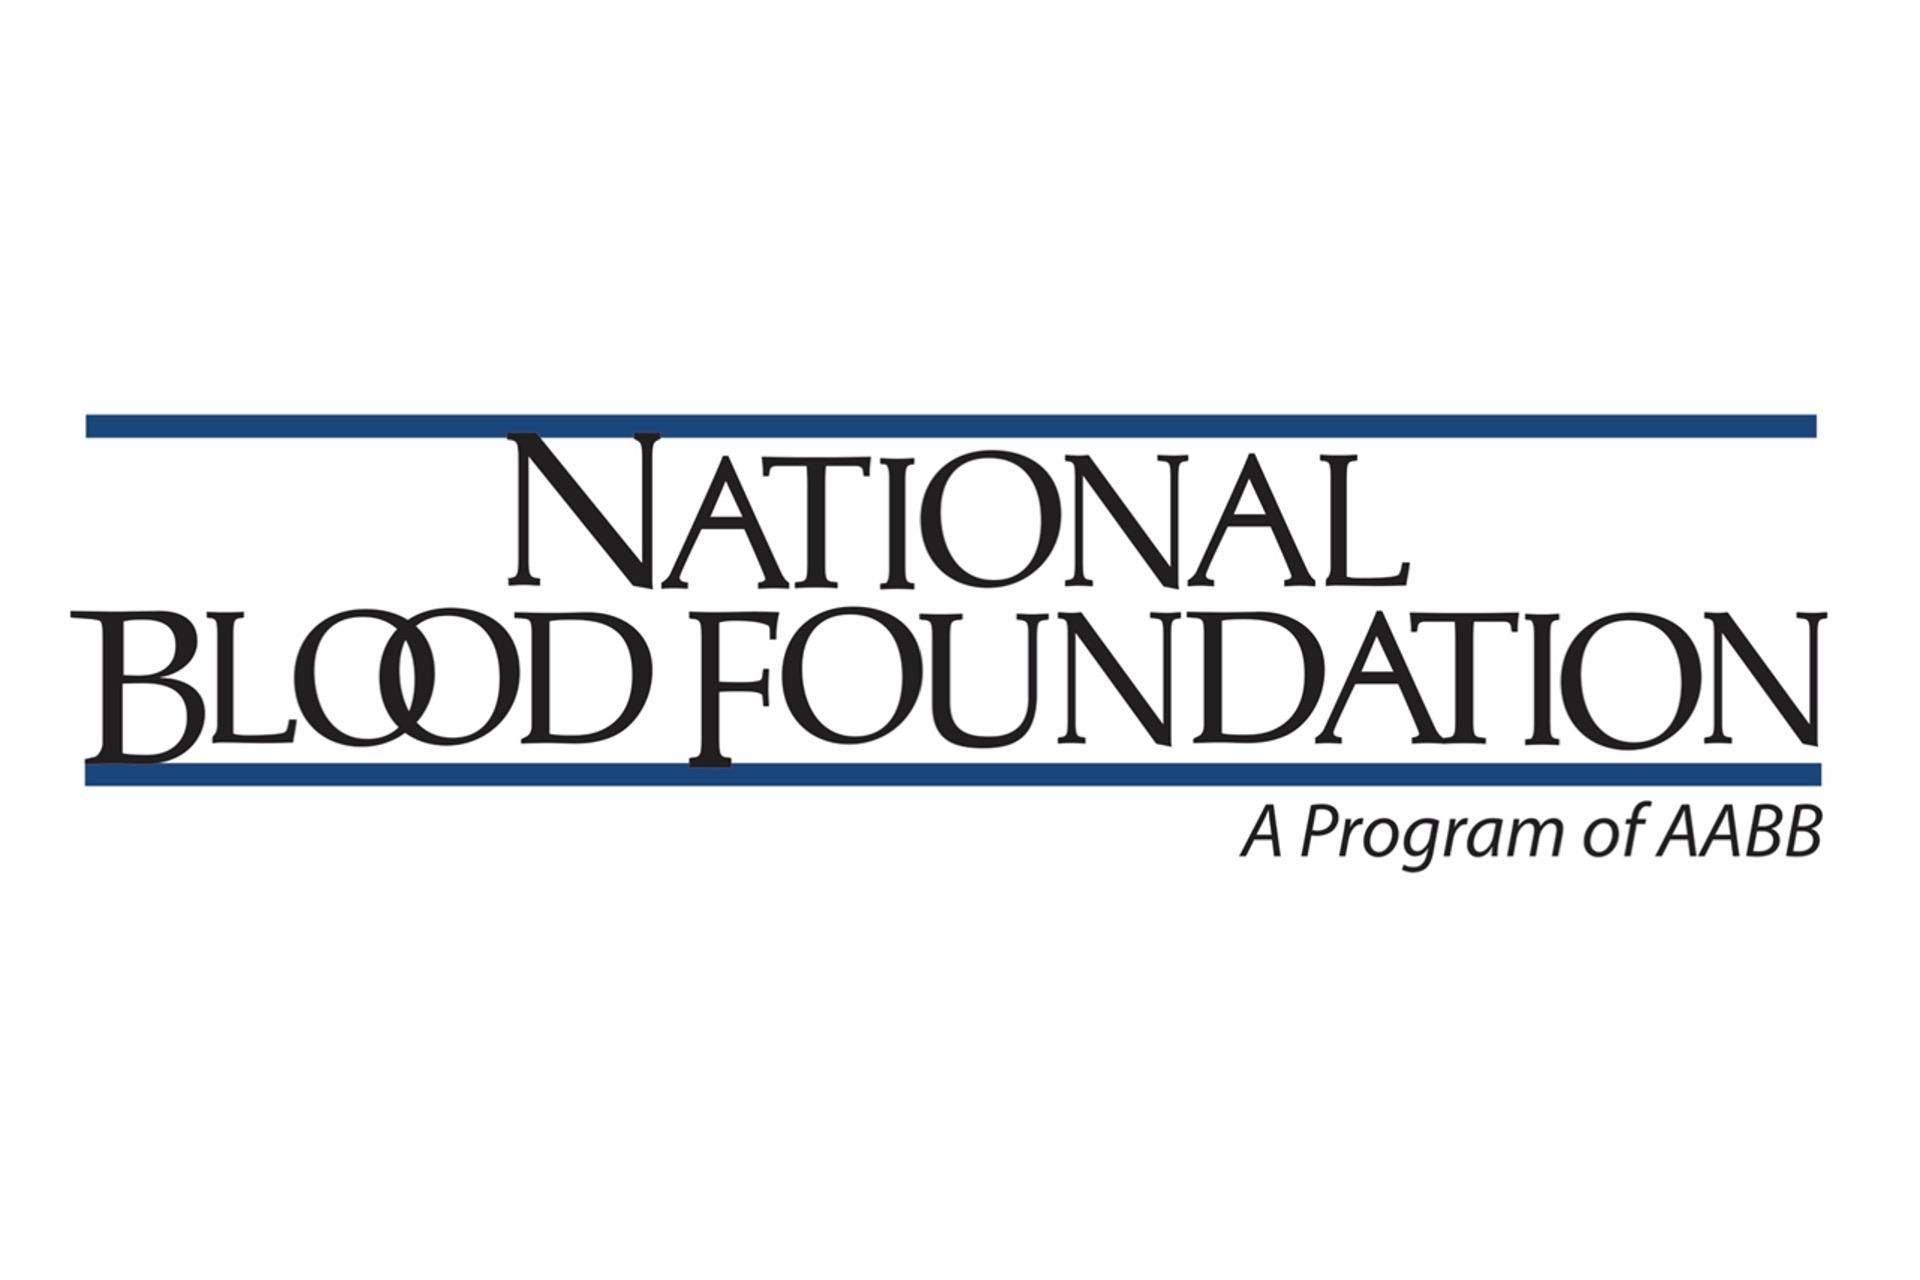 National Blood Foundation